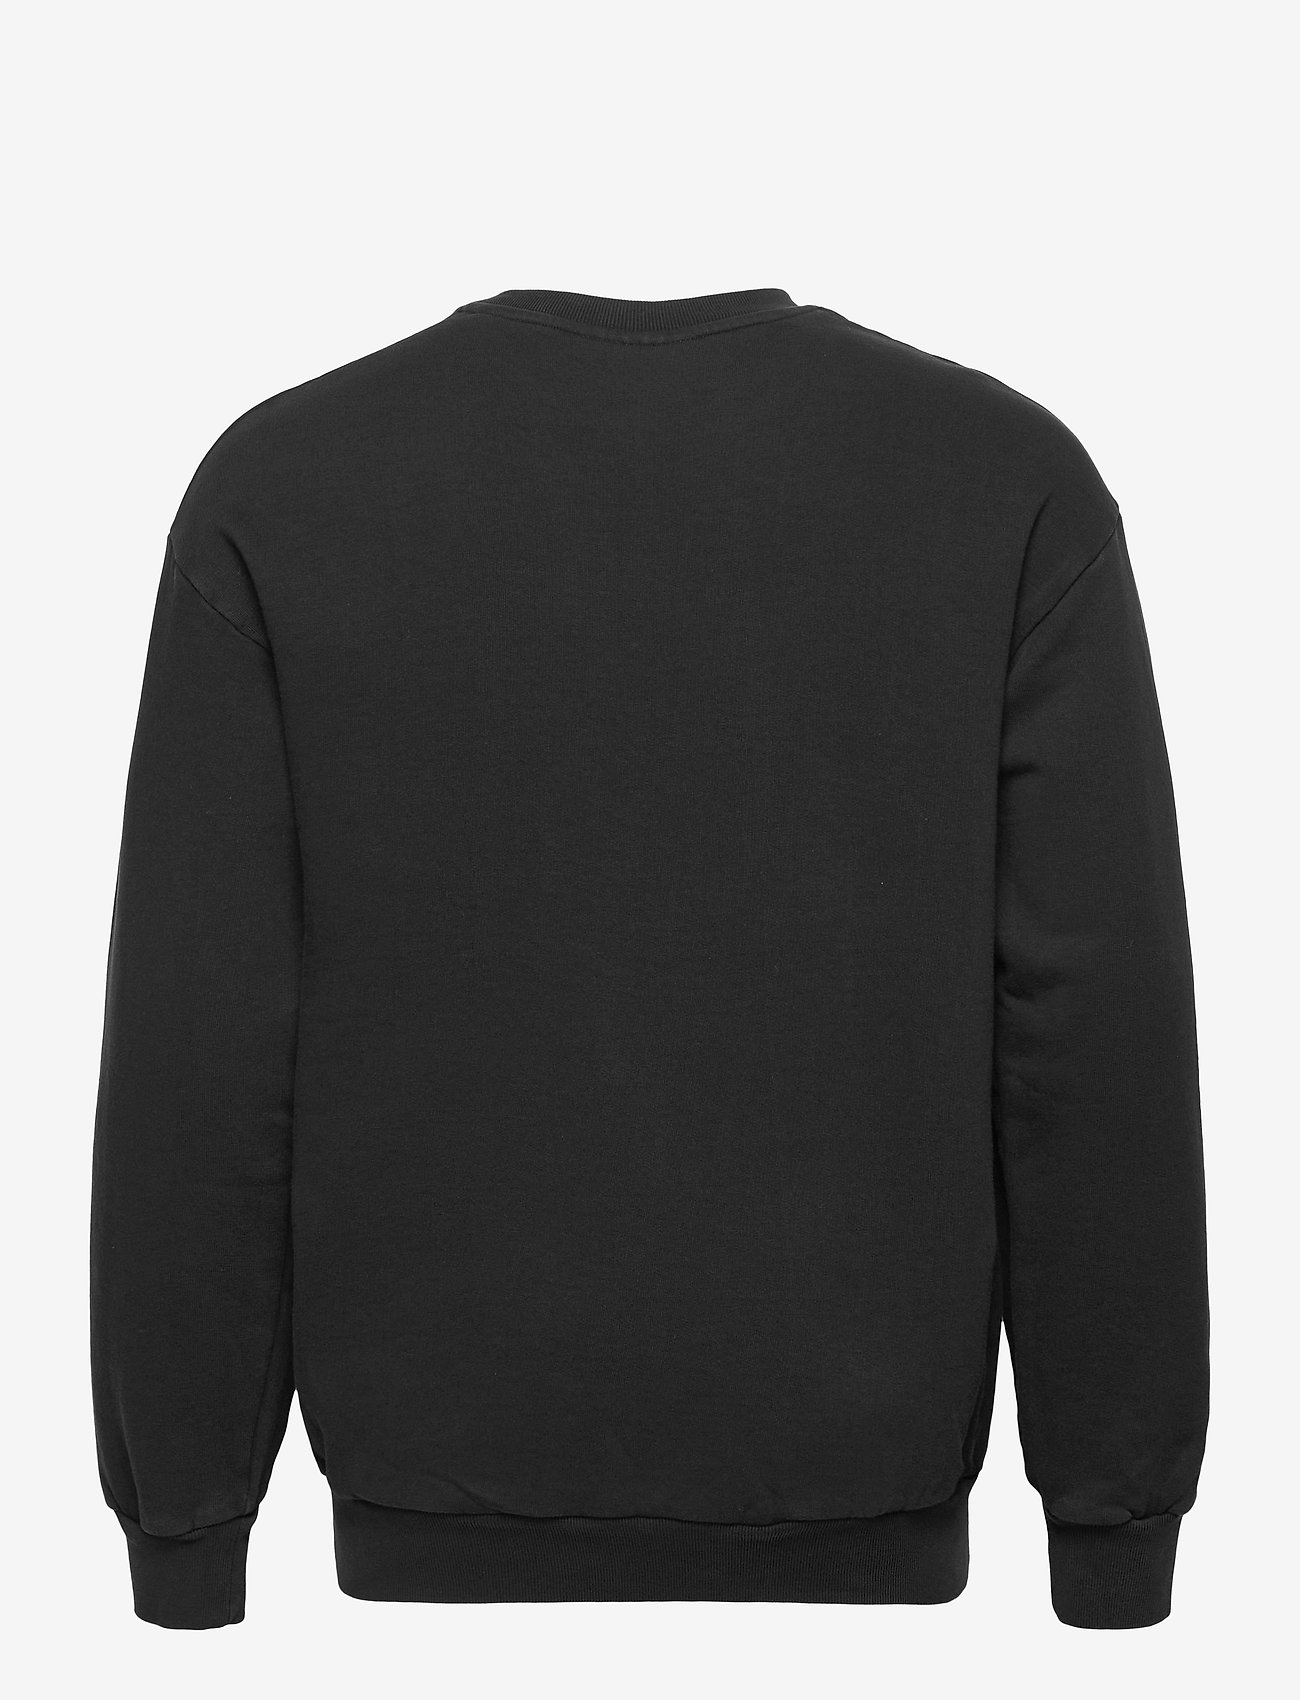 HAN Kjøbenhavn - Artwork Crew - truien - faded black hk - 1